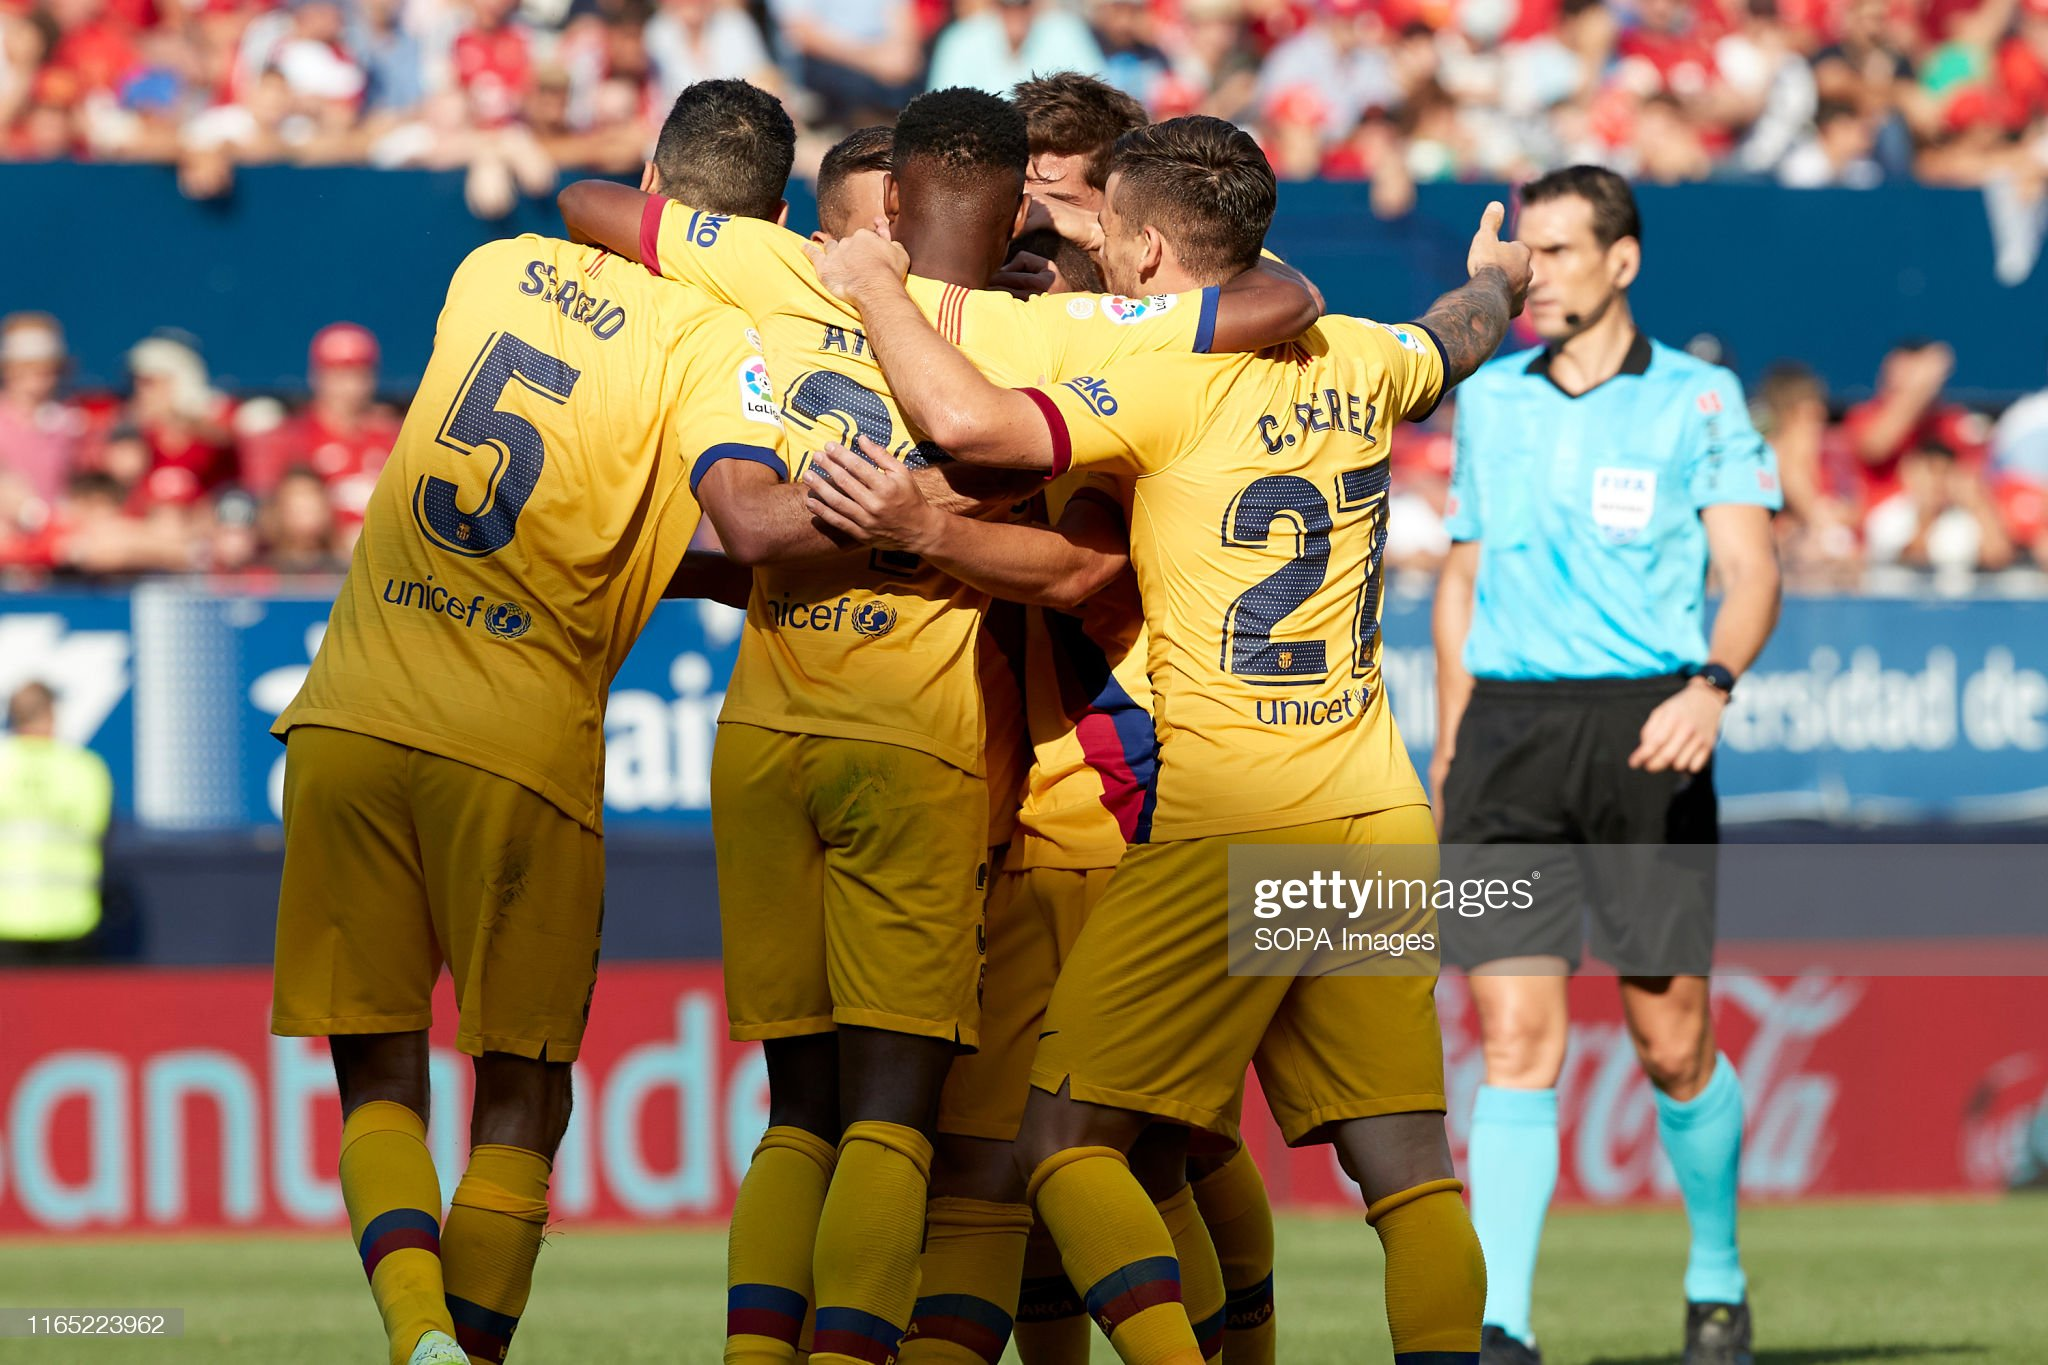 صور مباراة : أوساسونا - برشلونة 2-2 ( 31-08-2019 )  Barcelona-celebrates-a-goal-during-the-spanish-la-liga-santander-ca-picture-id1165223962?s=2048x2048